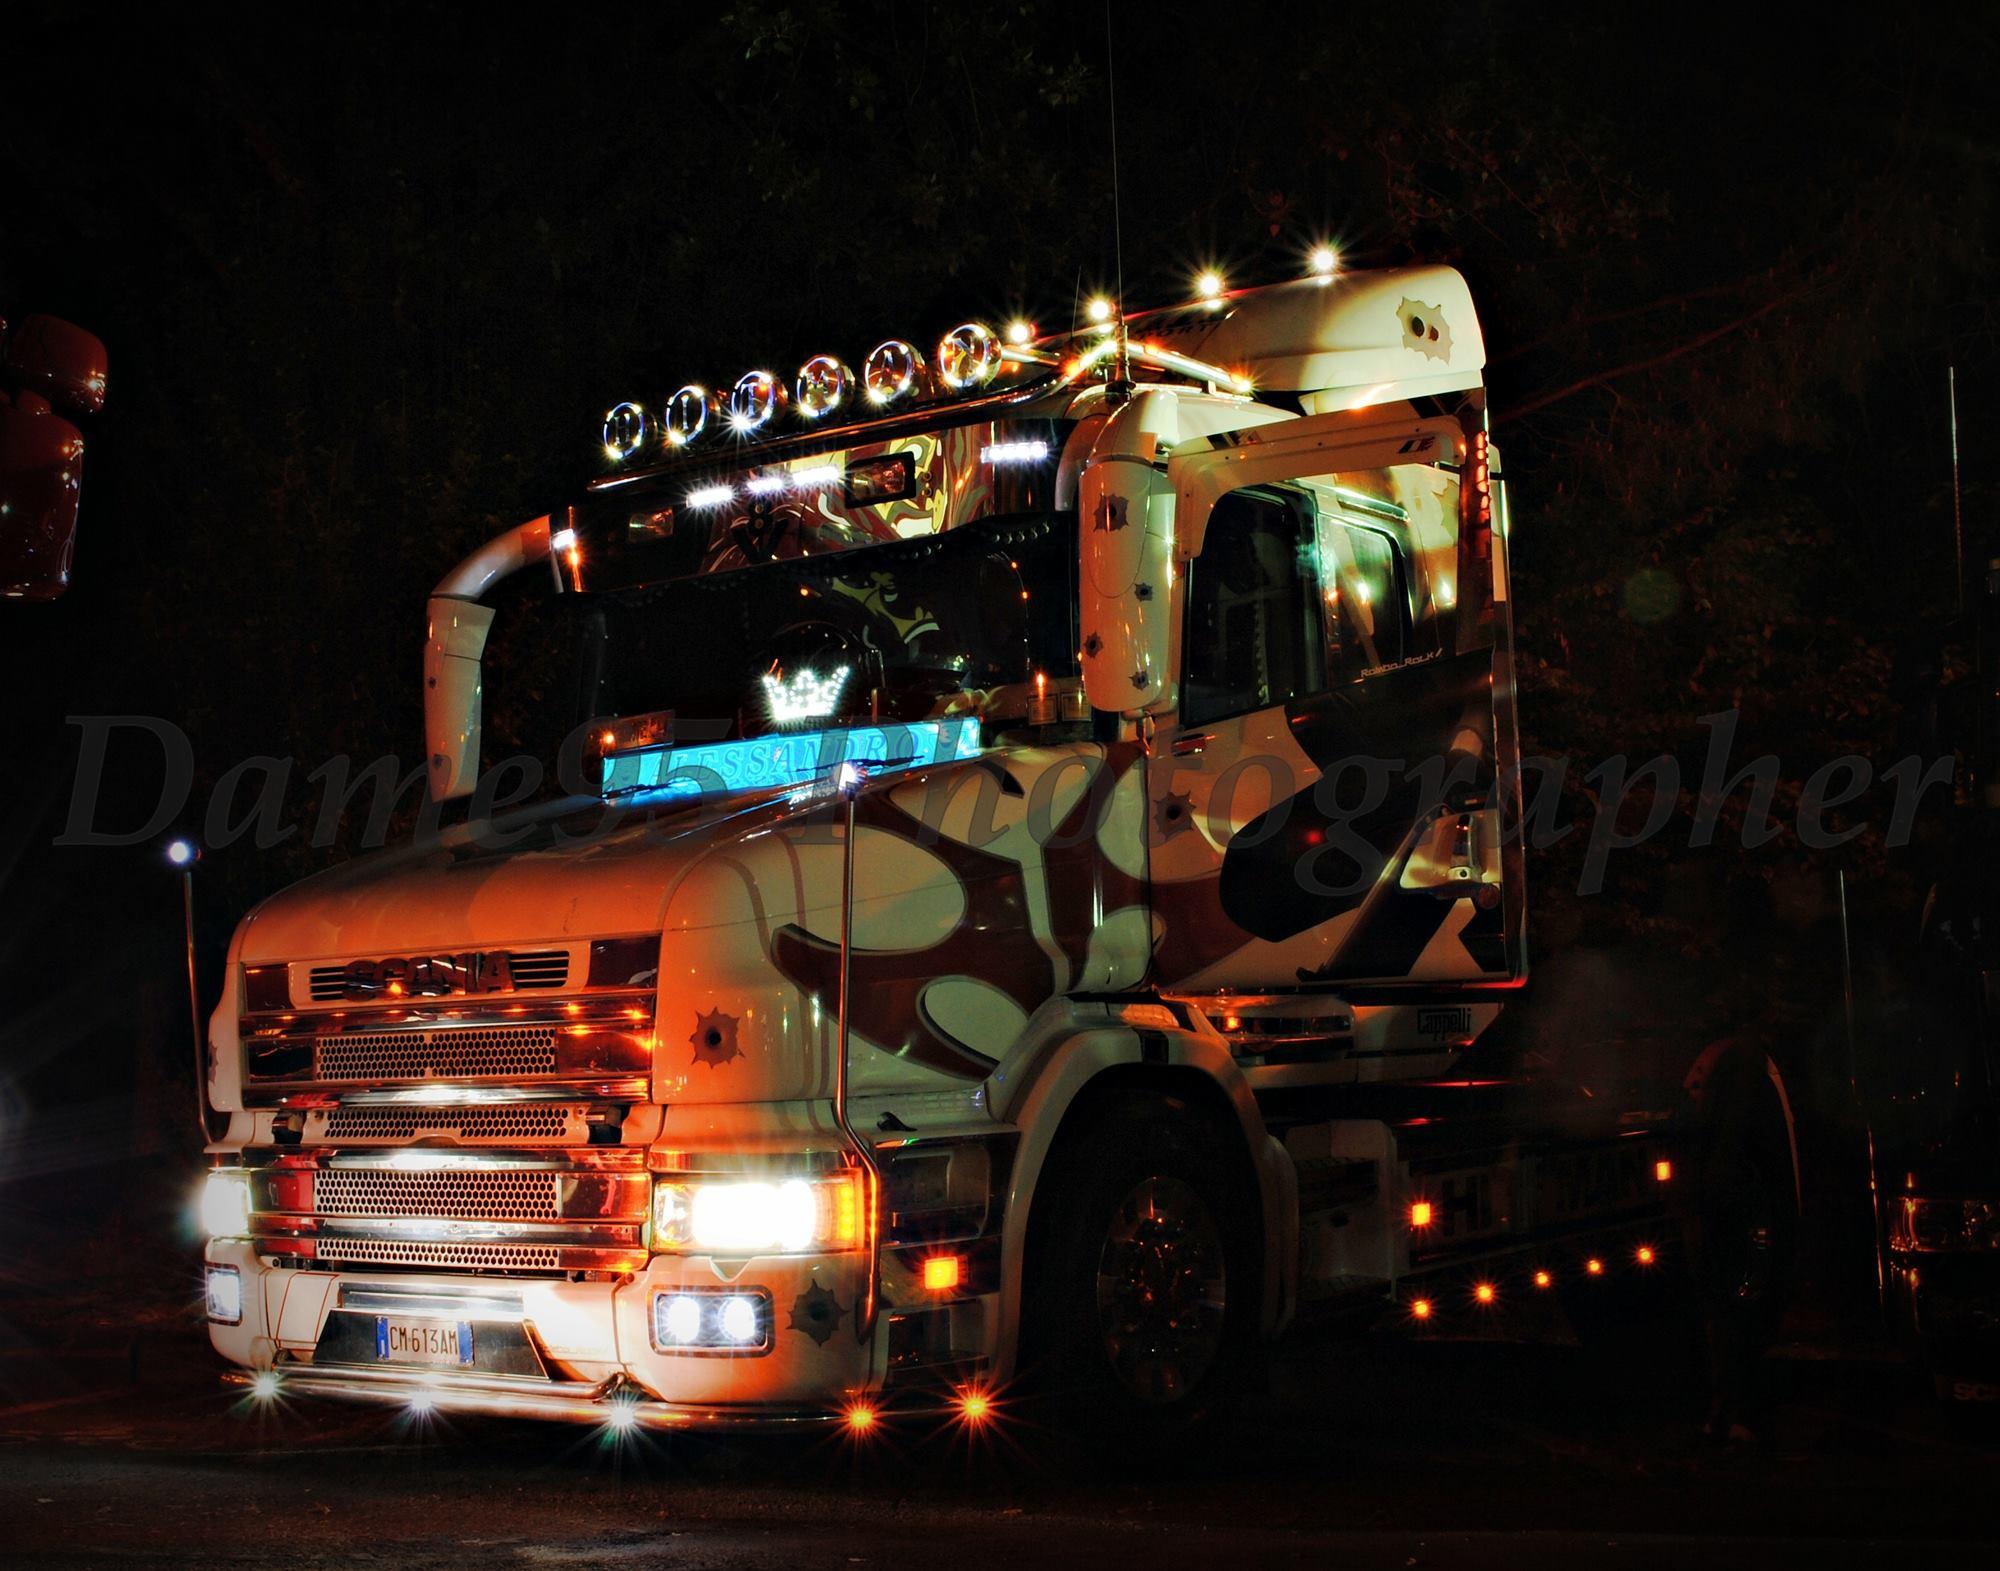 Romborock 2015